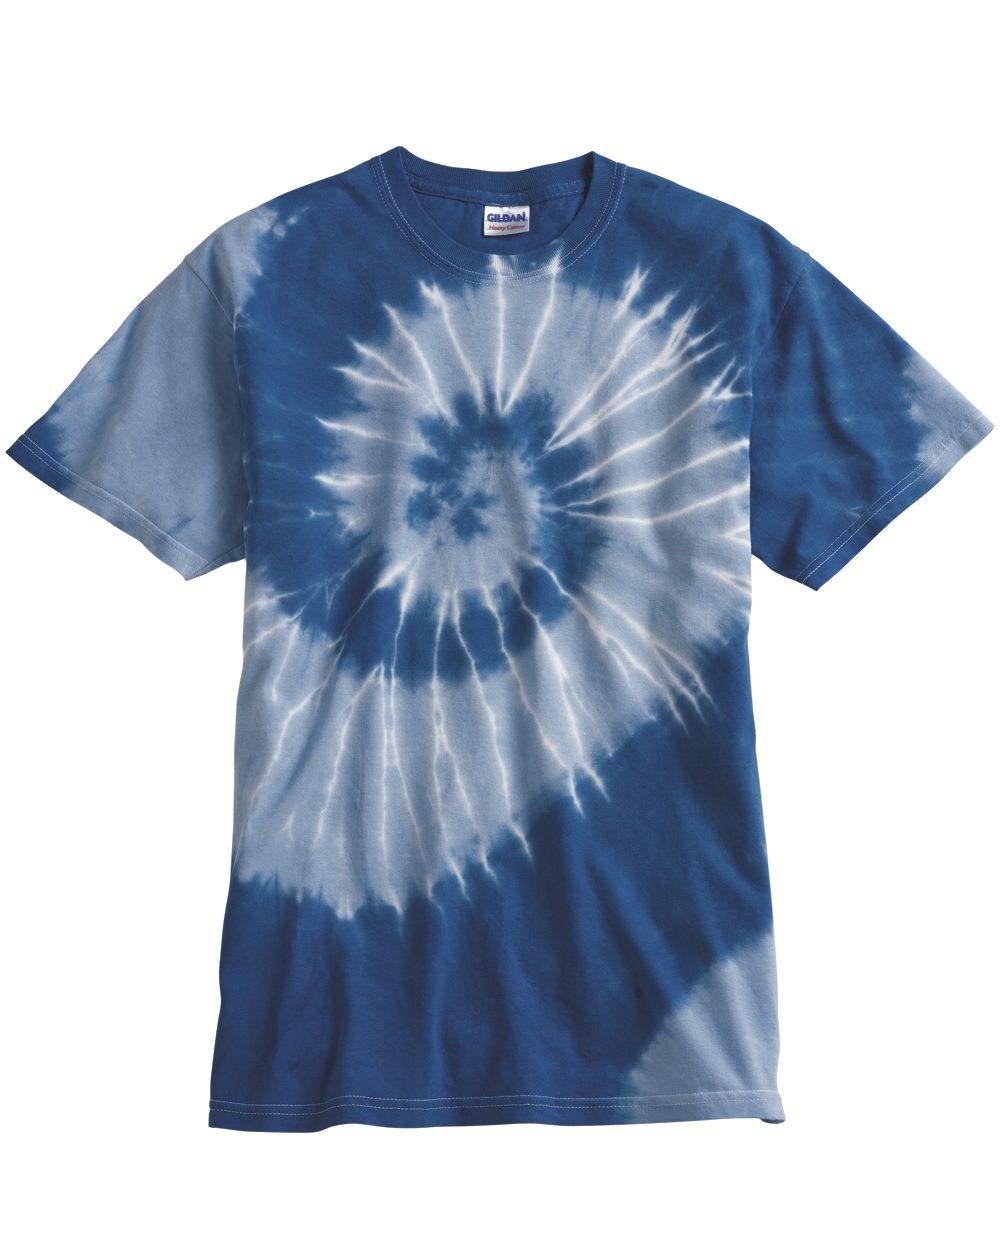 Dyenomite 20021 同种颜色不同色度的螺旋花纹T恤